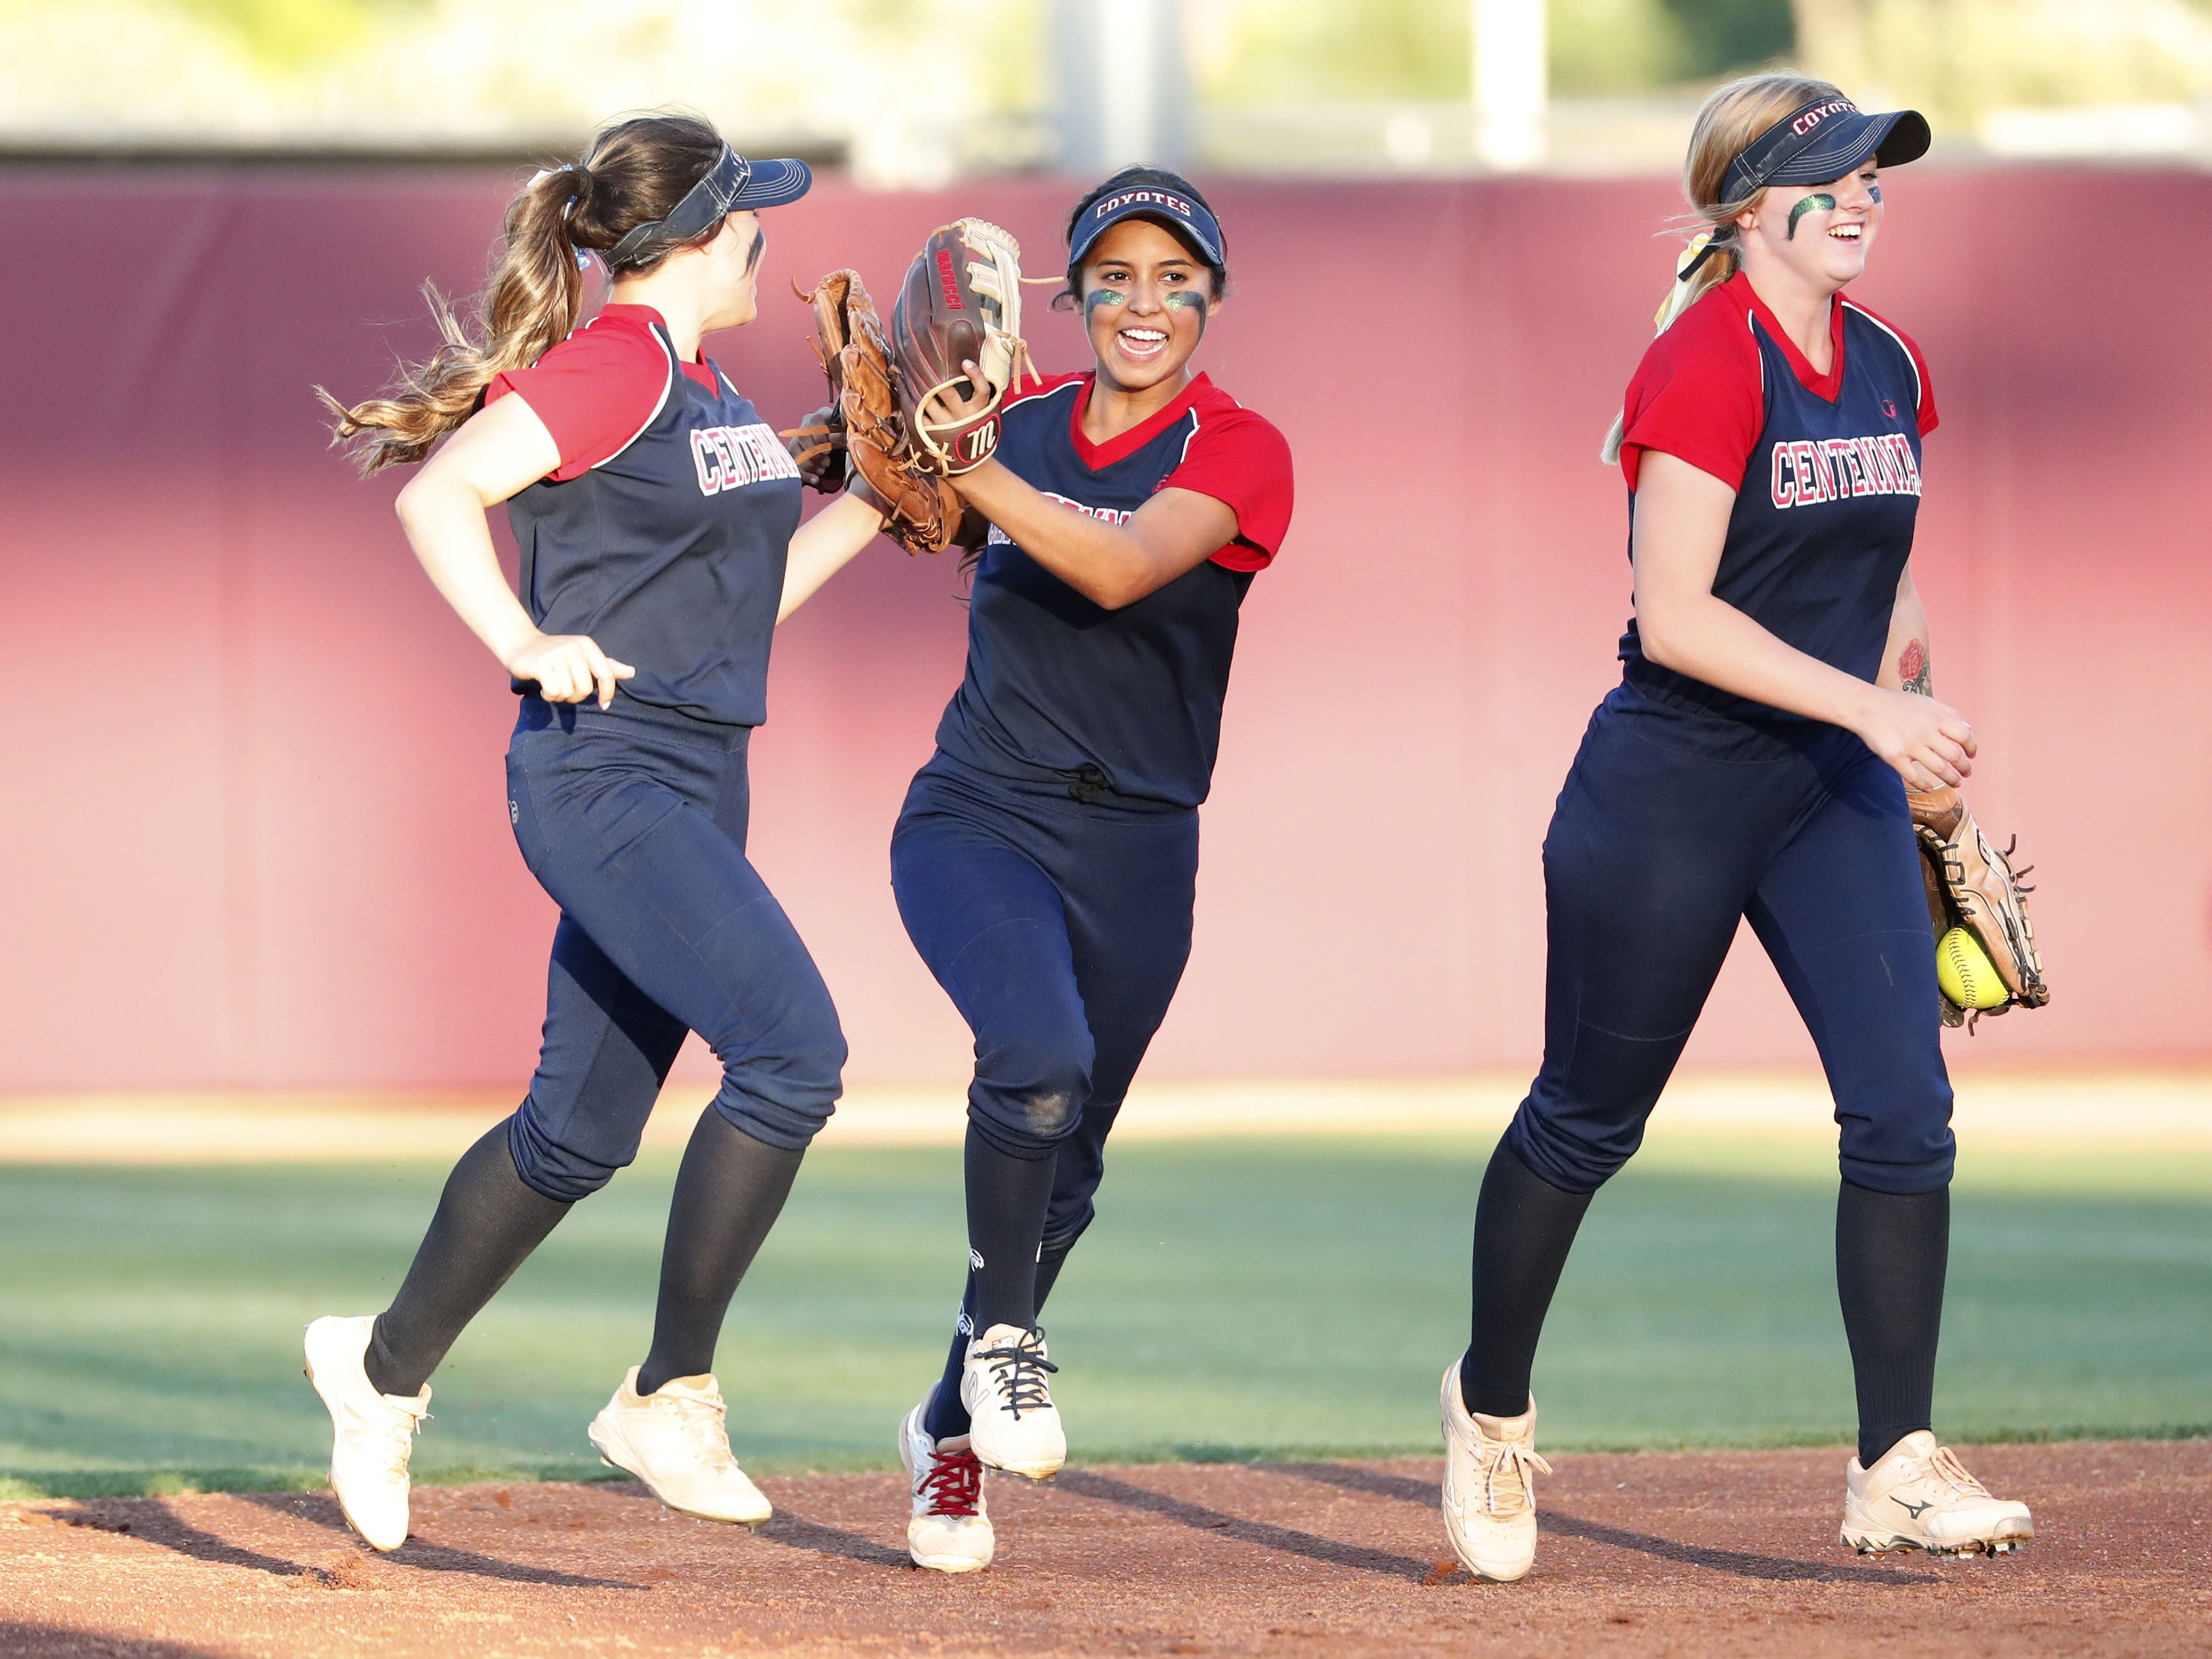 Centennial center fielder Jaydin Gonzalez (left) high-fives Natalie Vasquez between innings against Ironwood Ridge during the 5A State Softball Championship in Tempe, Ariz. May 13, 2019.